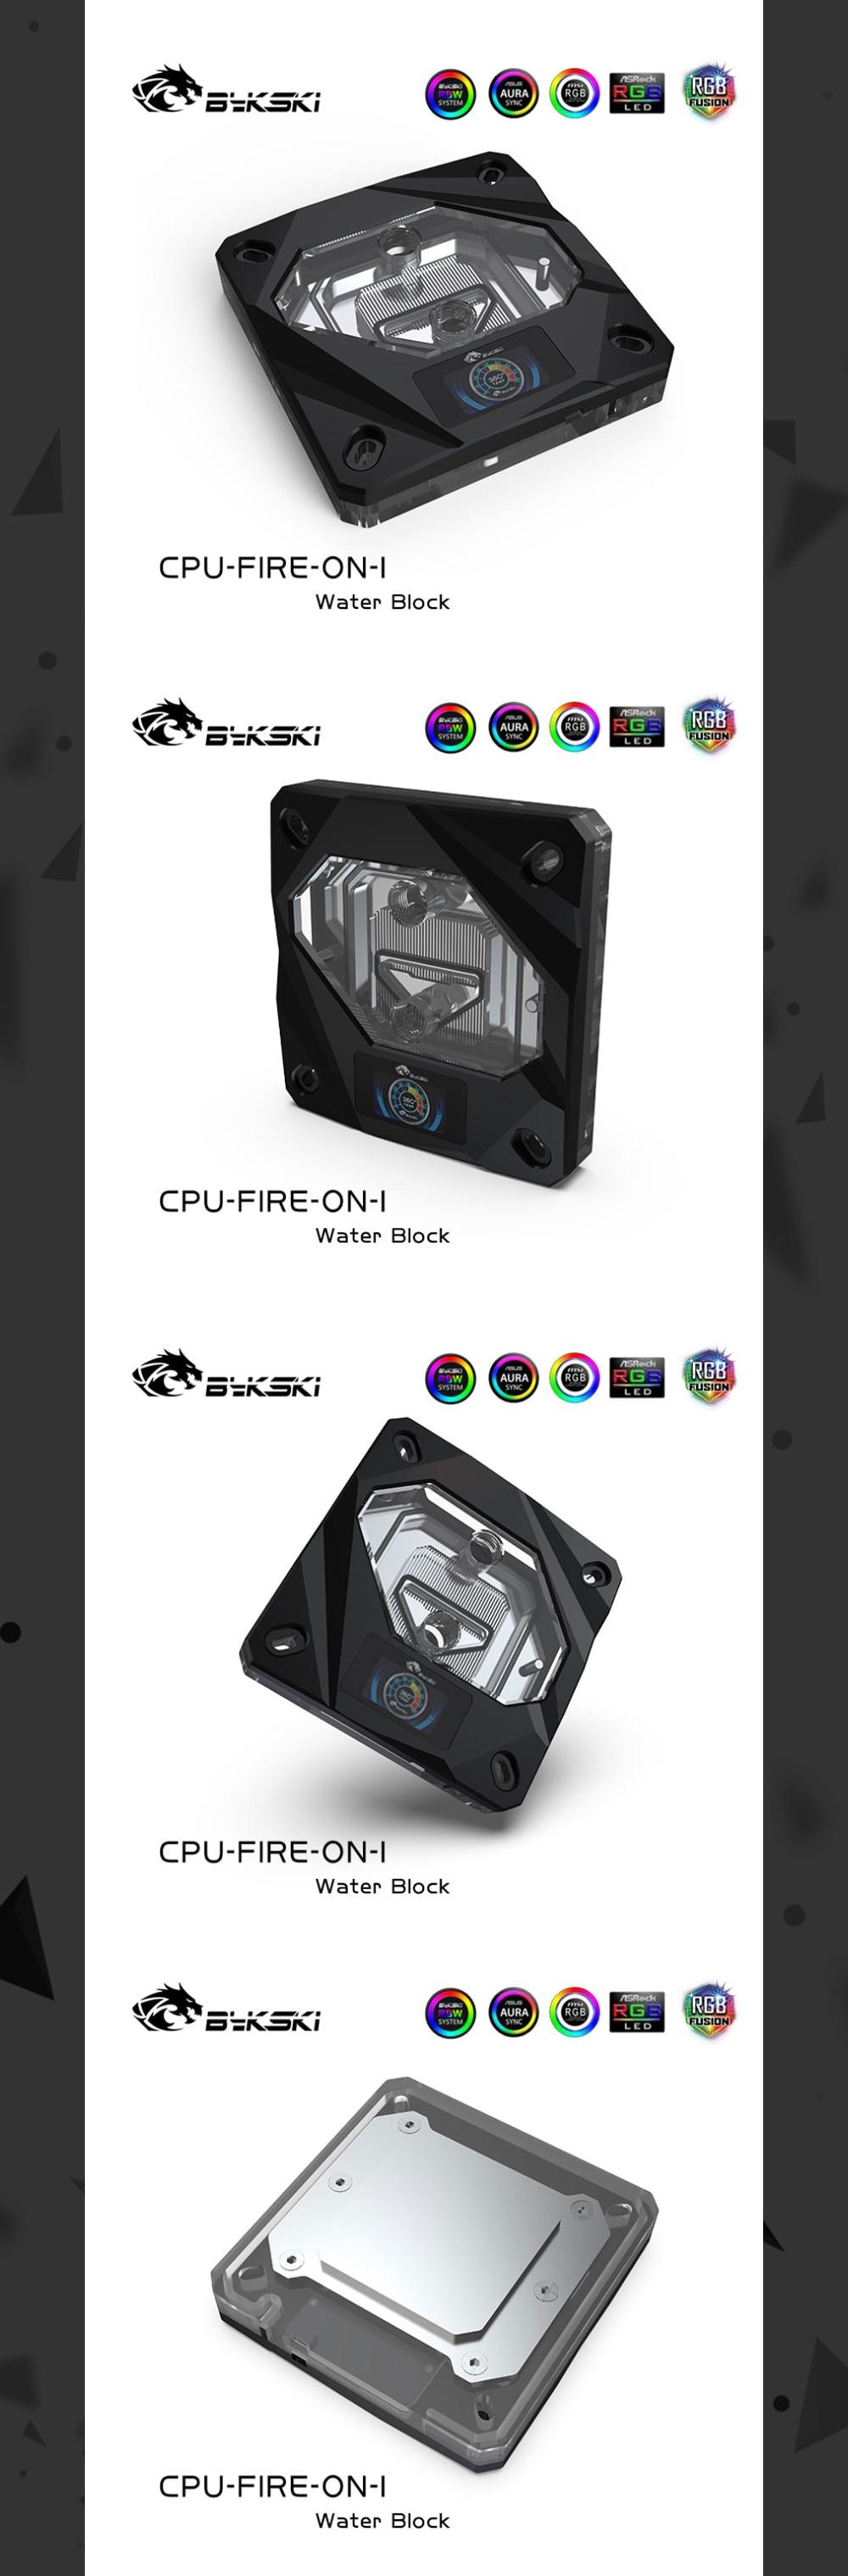 Bykski Temperature Digital Display CPU Water Block For Inter AMD, Intelligent Temperature Monitoring CPU-FIRE-ON CPU-RAY-ON-M